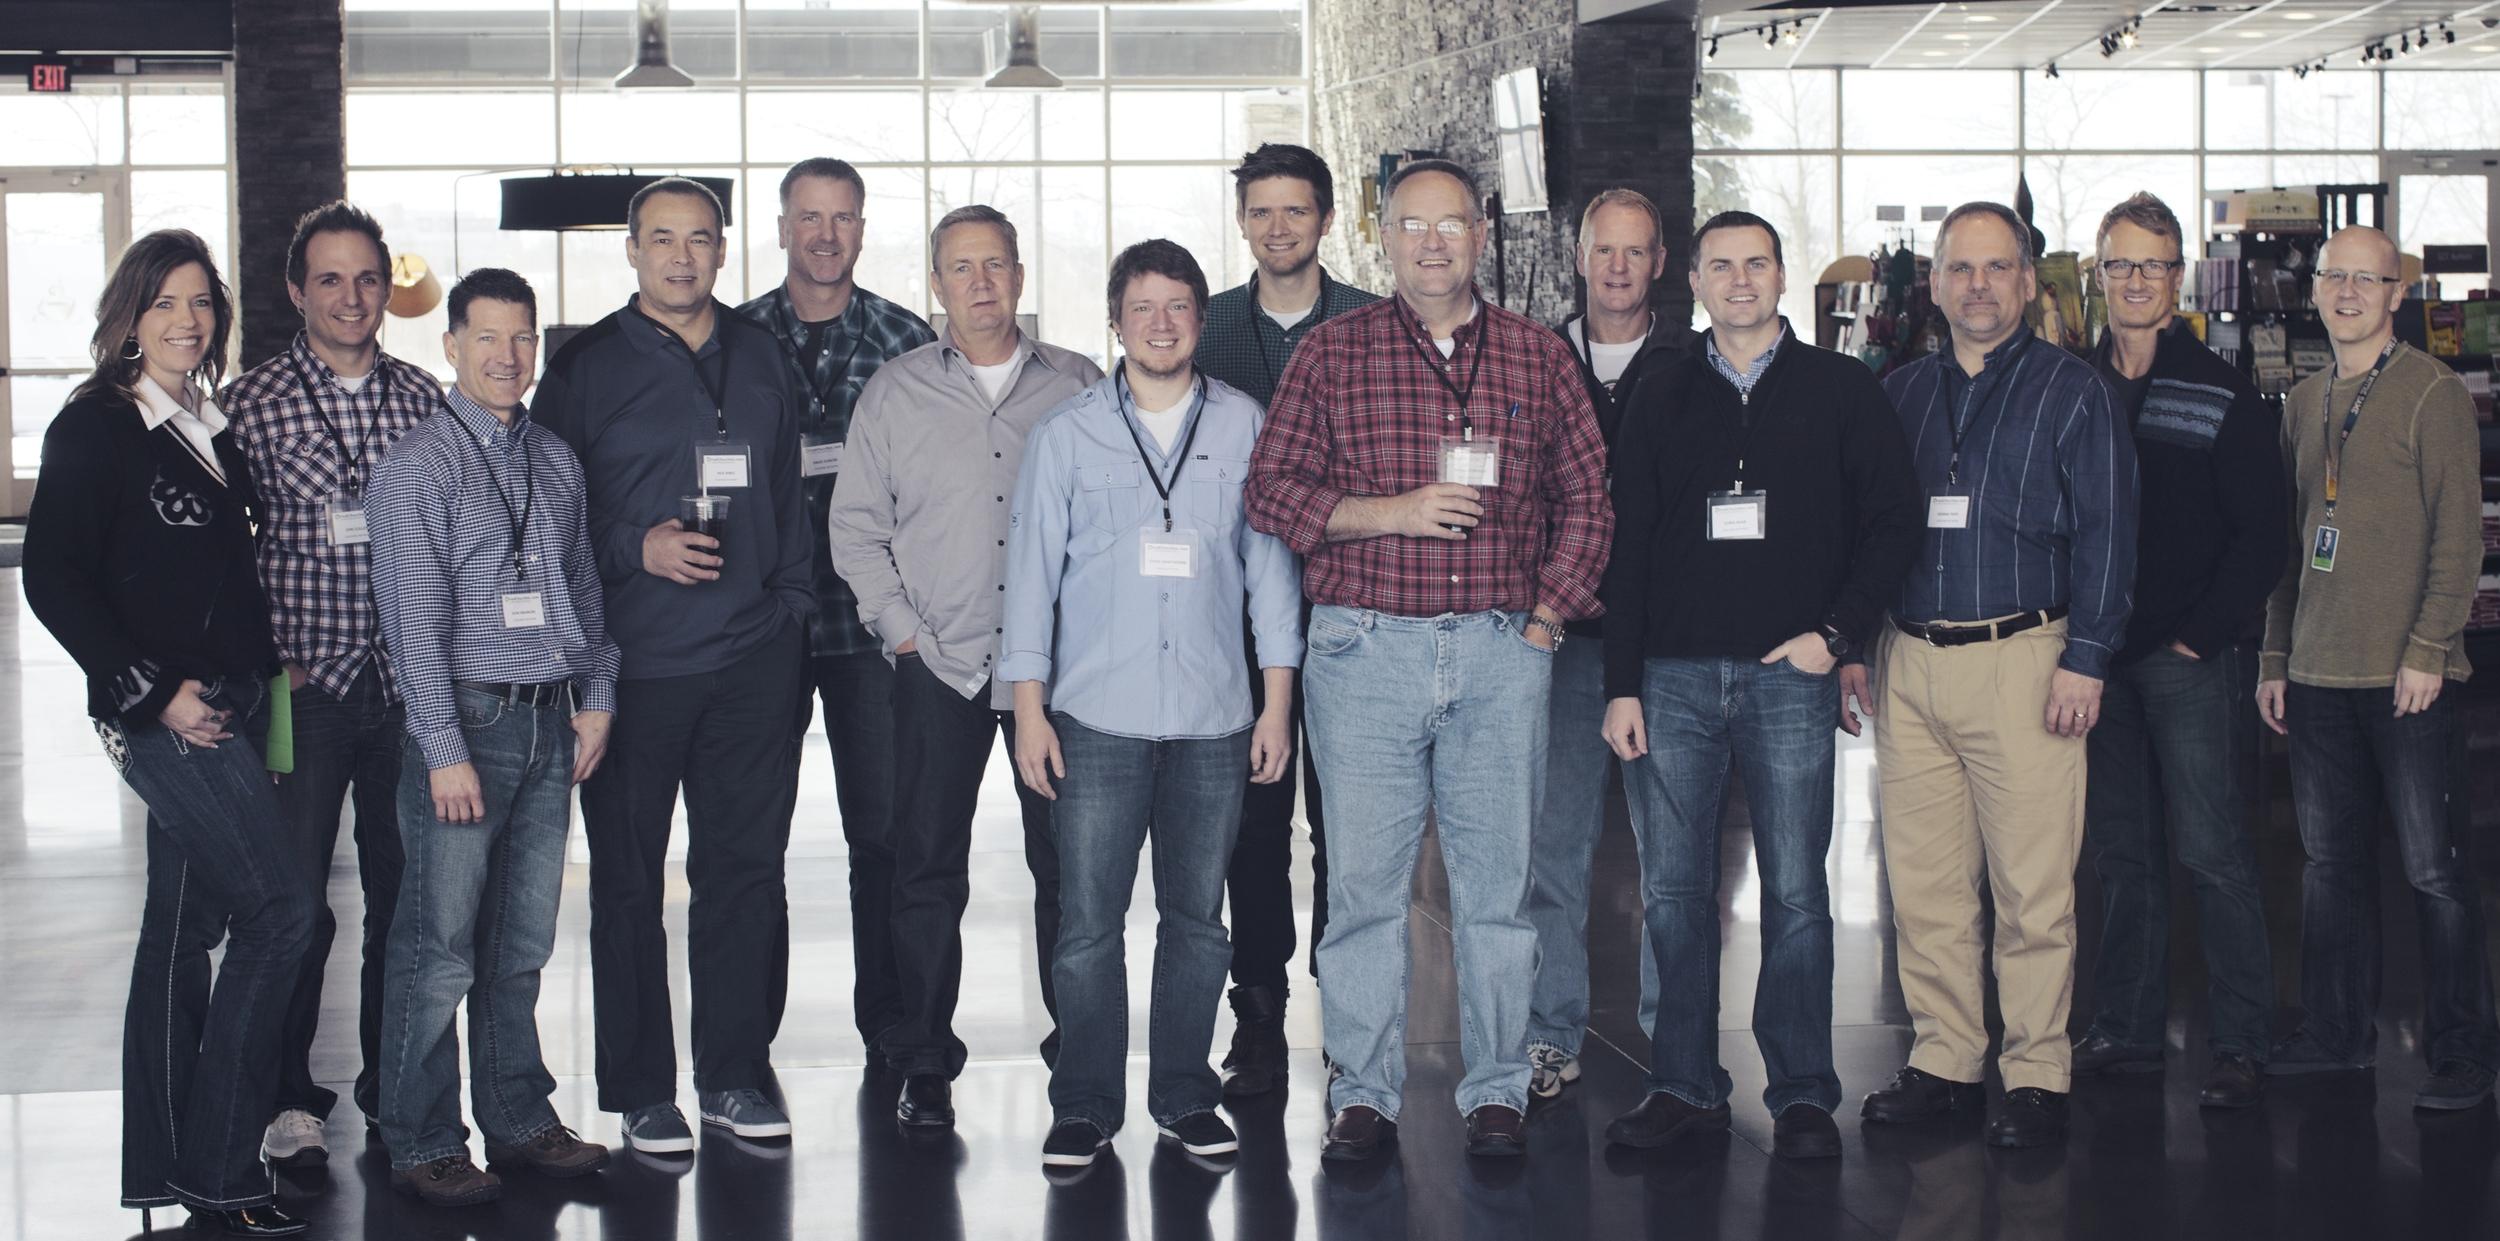 Executive Pastors' Coaching Network, March 2013